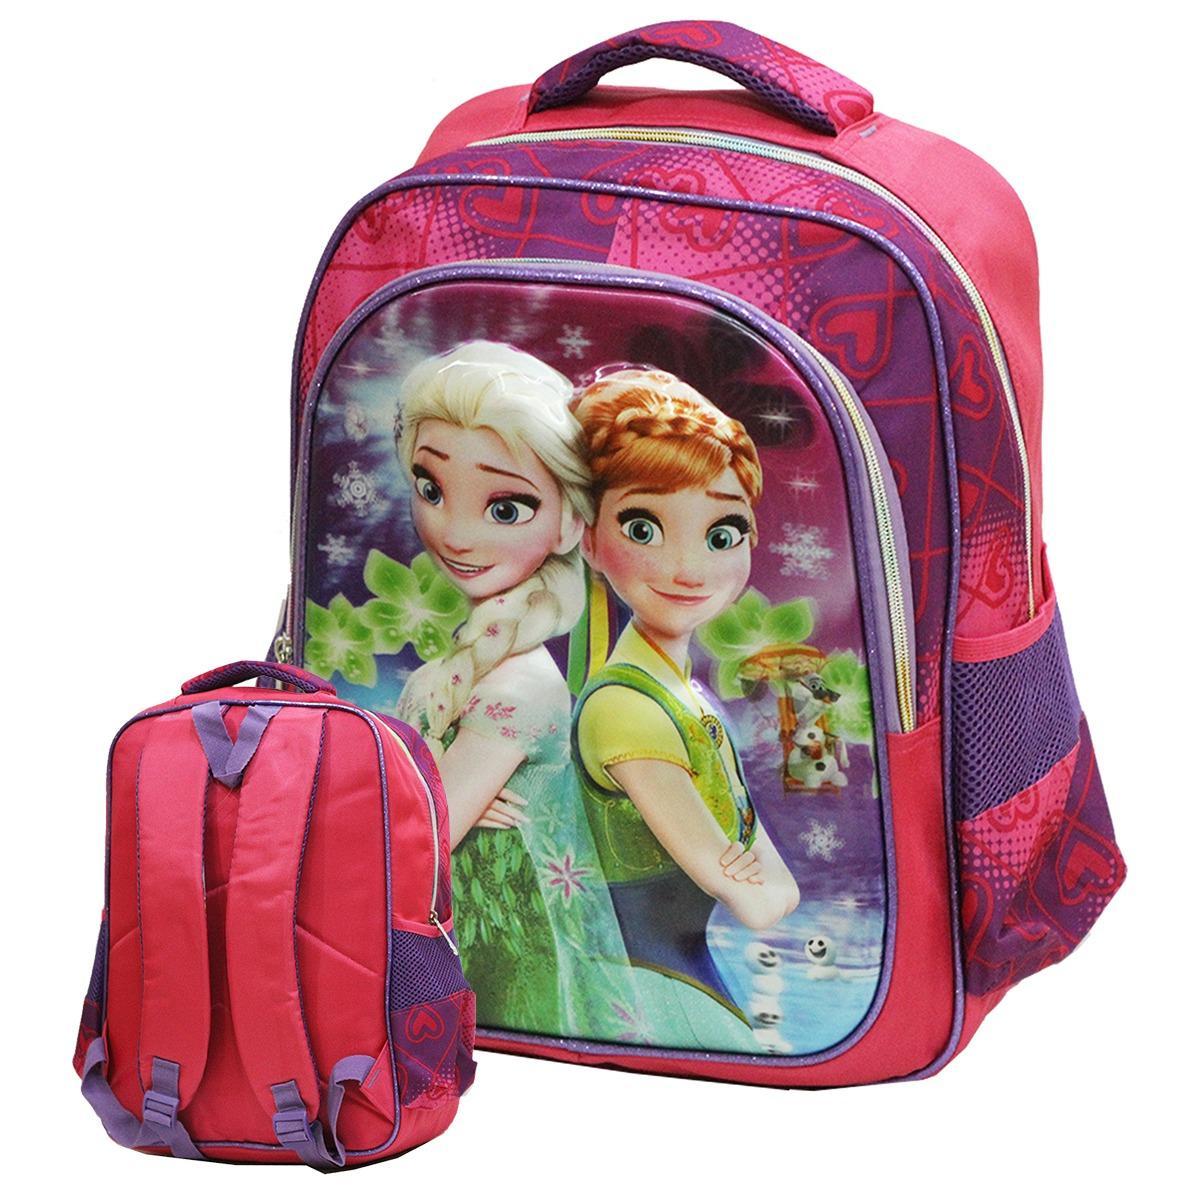 Katalog Onlan Disney Frozen Fever 5D Timbul Hologram Tas Ransel Anak Sekolah Sd Dua Kantung Import Purple Onlan Terbaru